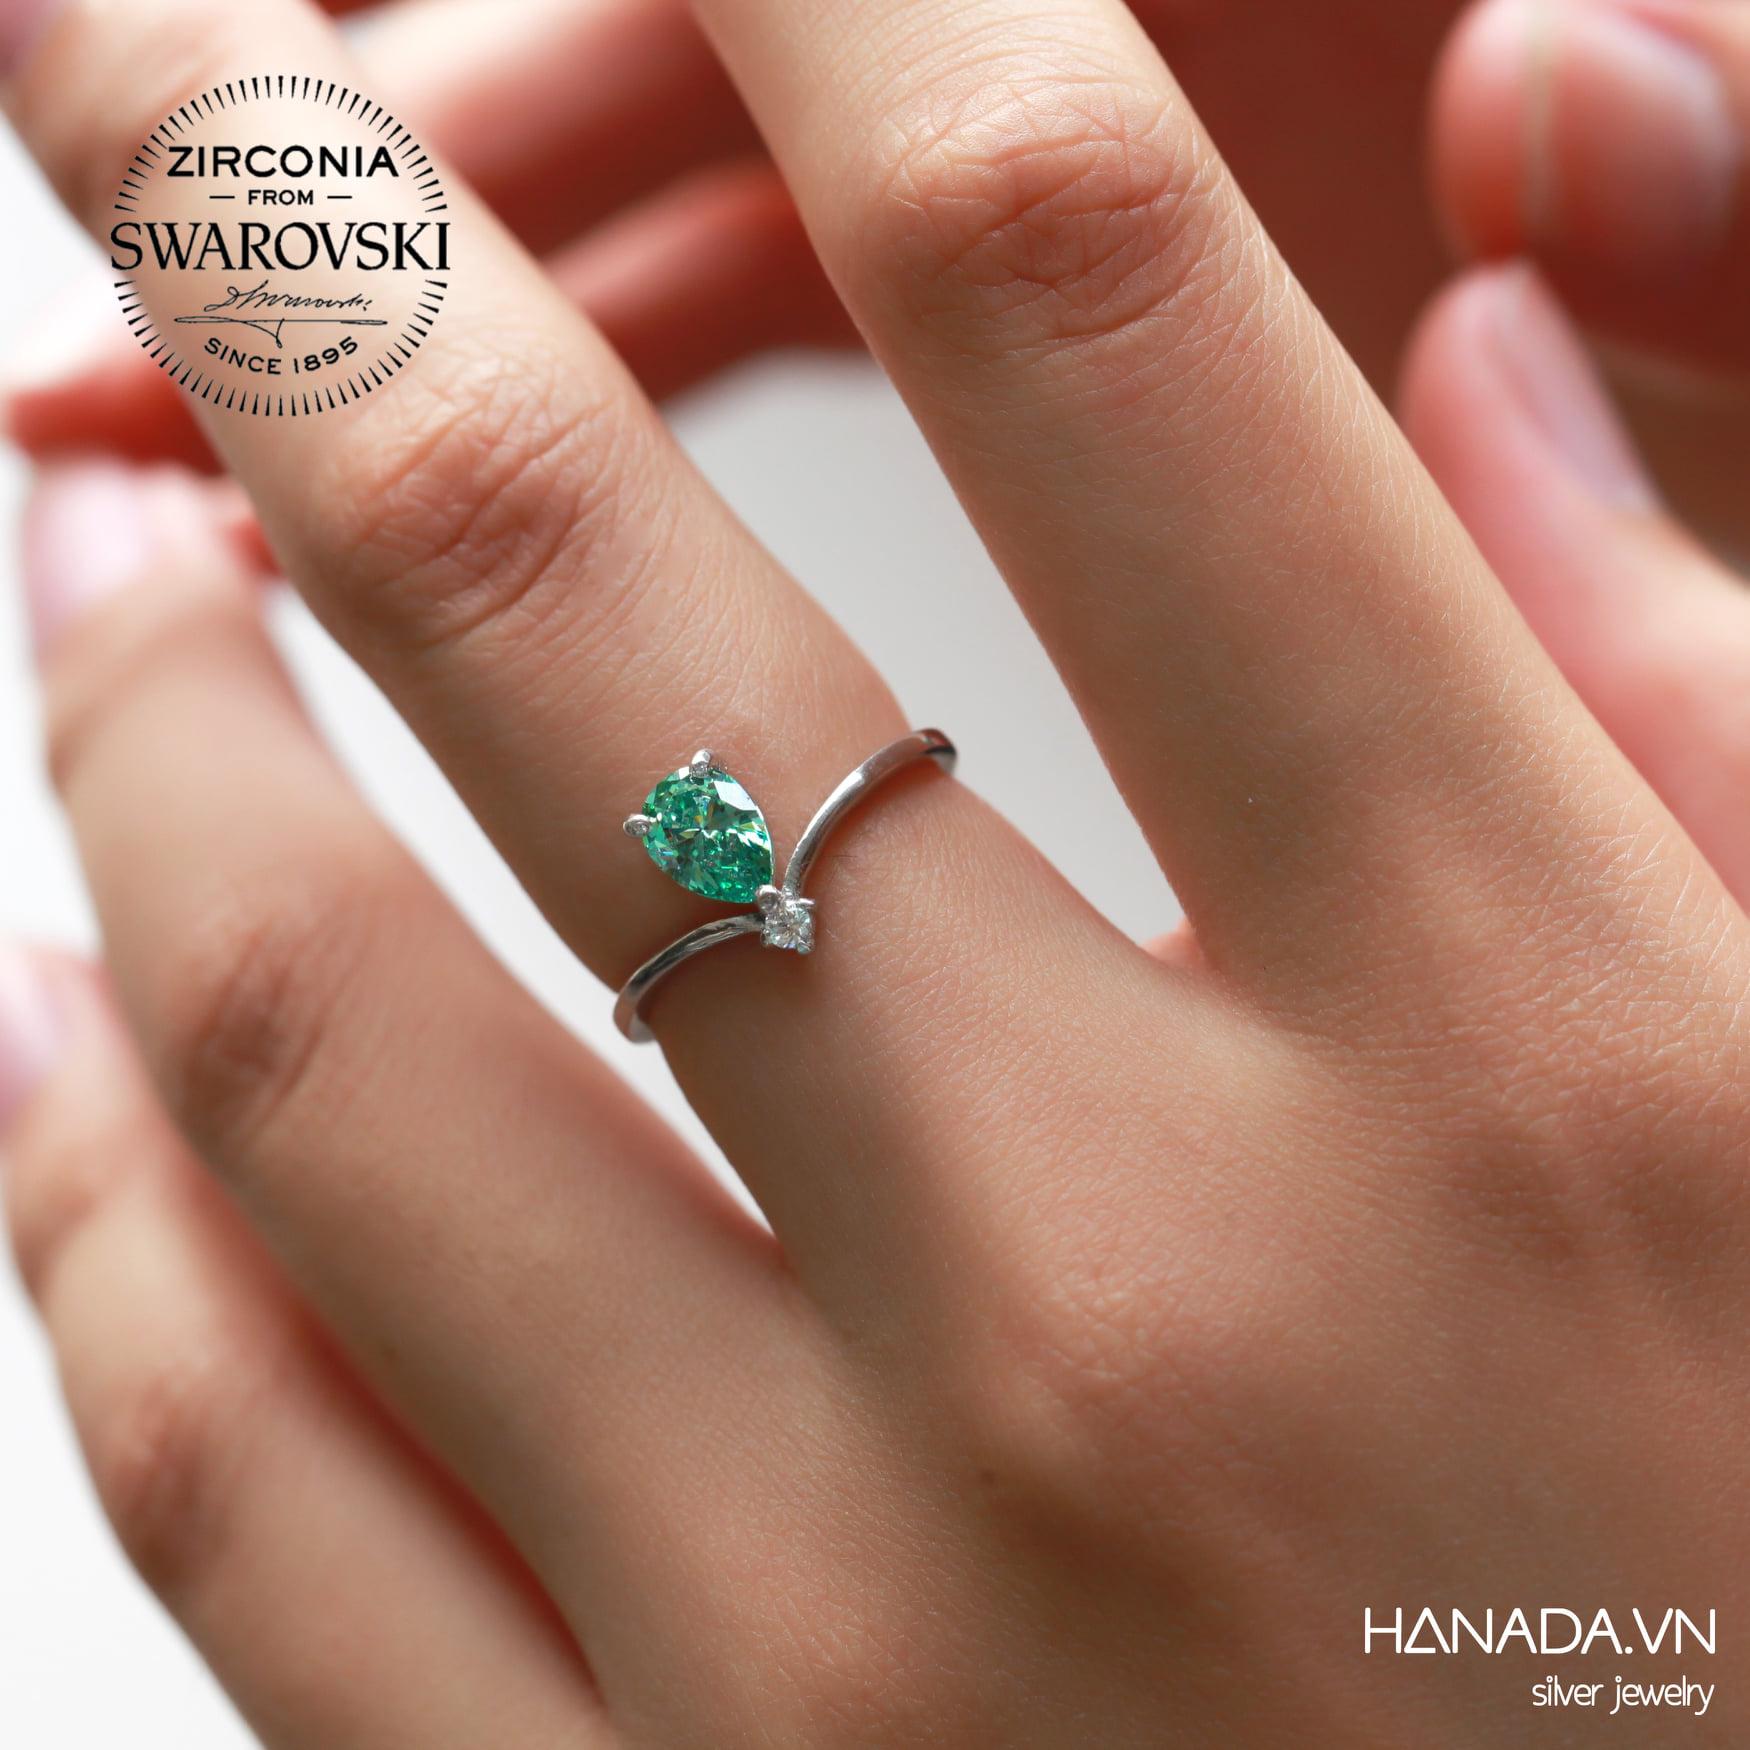 Nhẫn Bạc 925 Hanada Nhẫn Premium-Swarovski Crown HA.N1234.R.2.S.1200. 0685